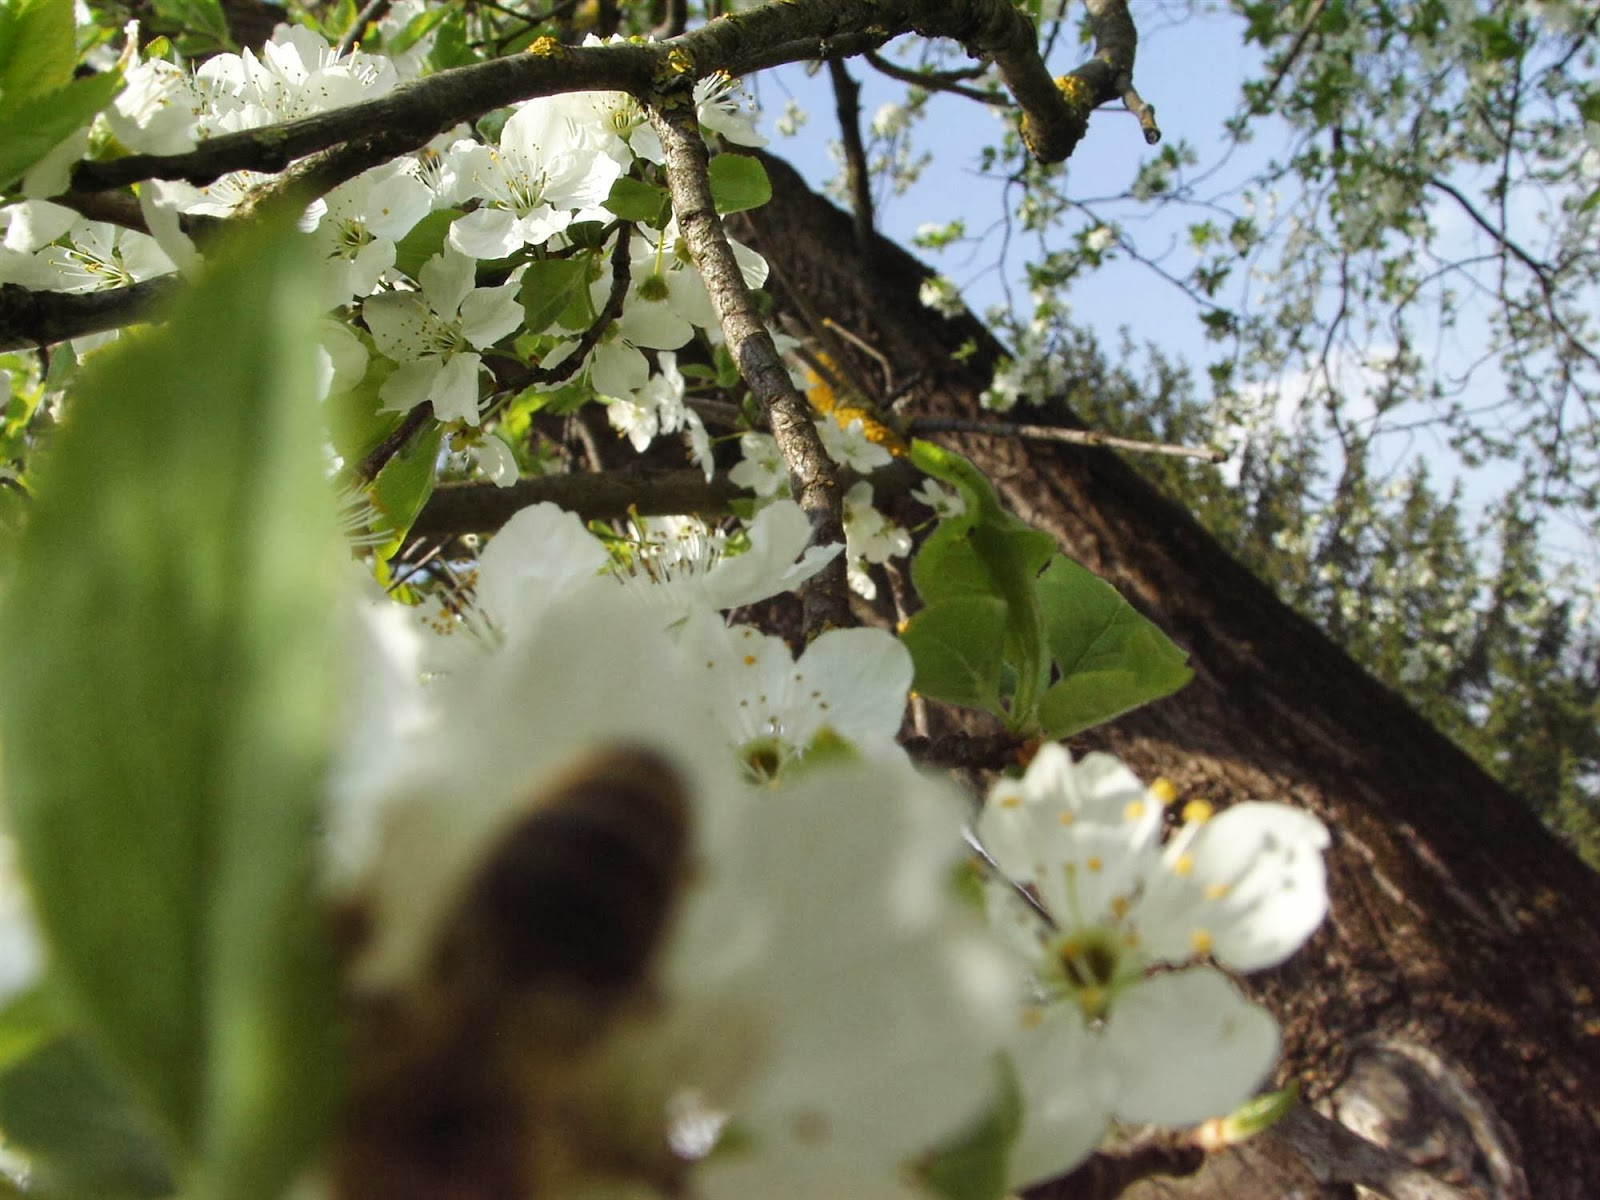 Zbiranje papirja, Ilirska Bistrica 2006 - KIF_8412.JPG